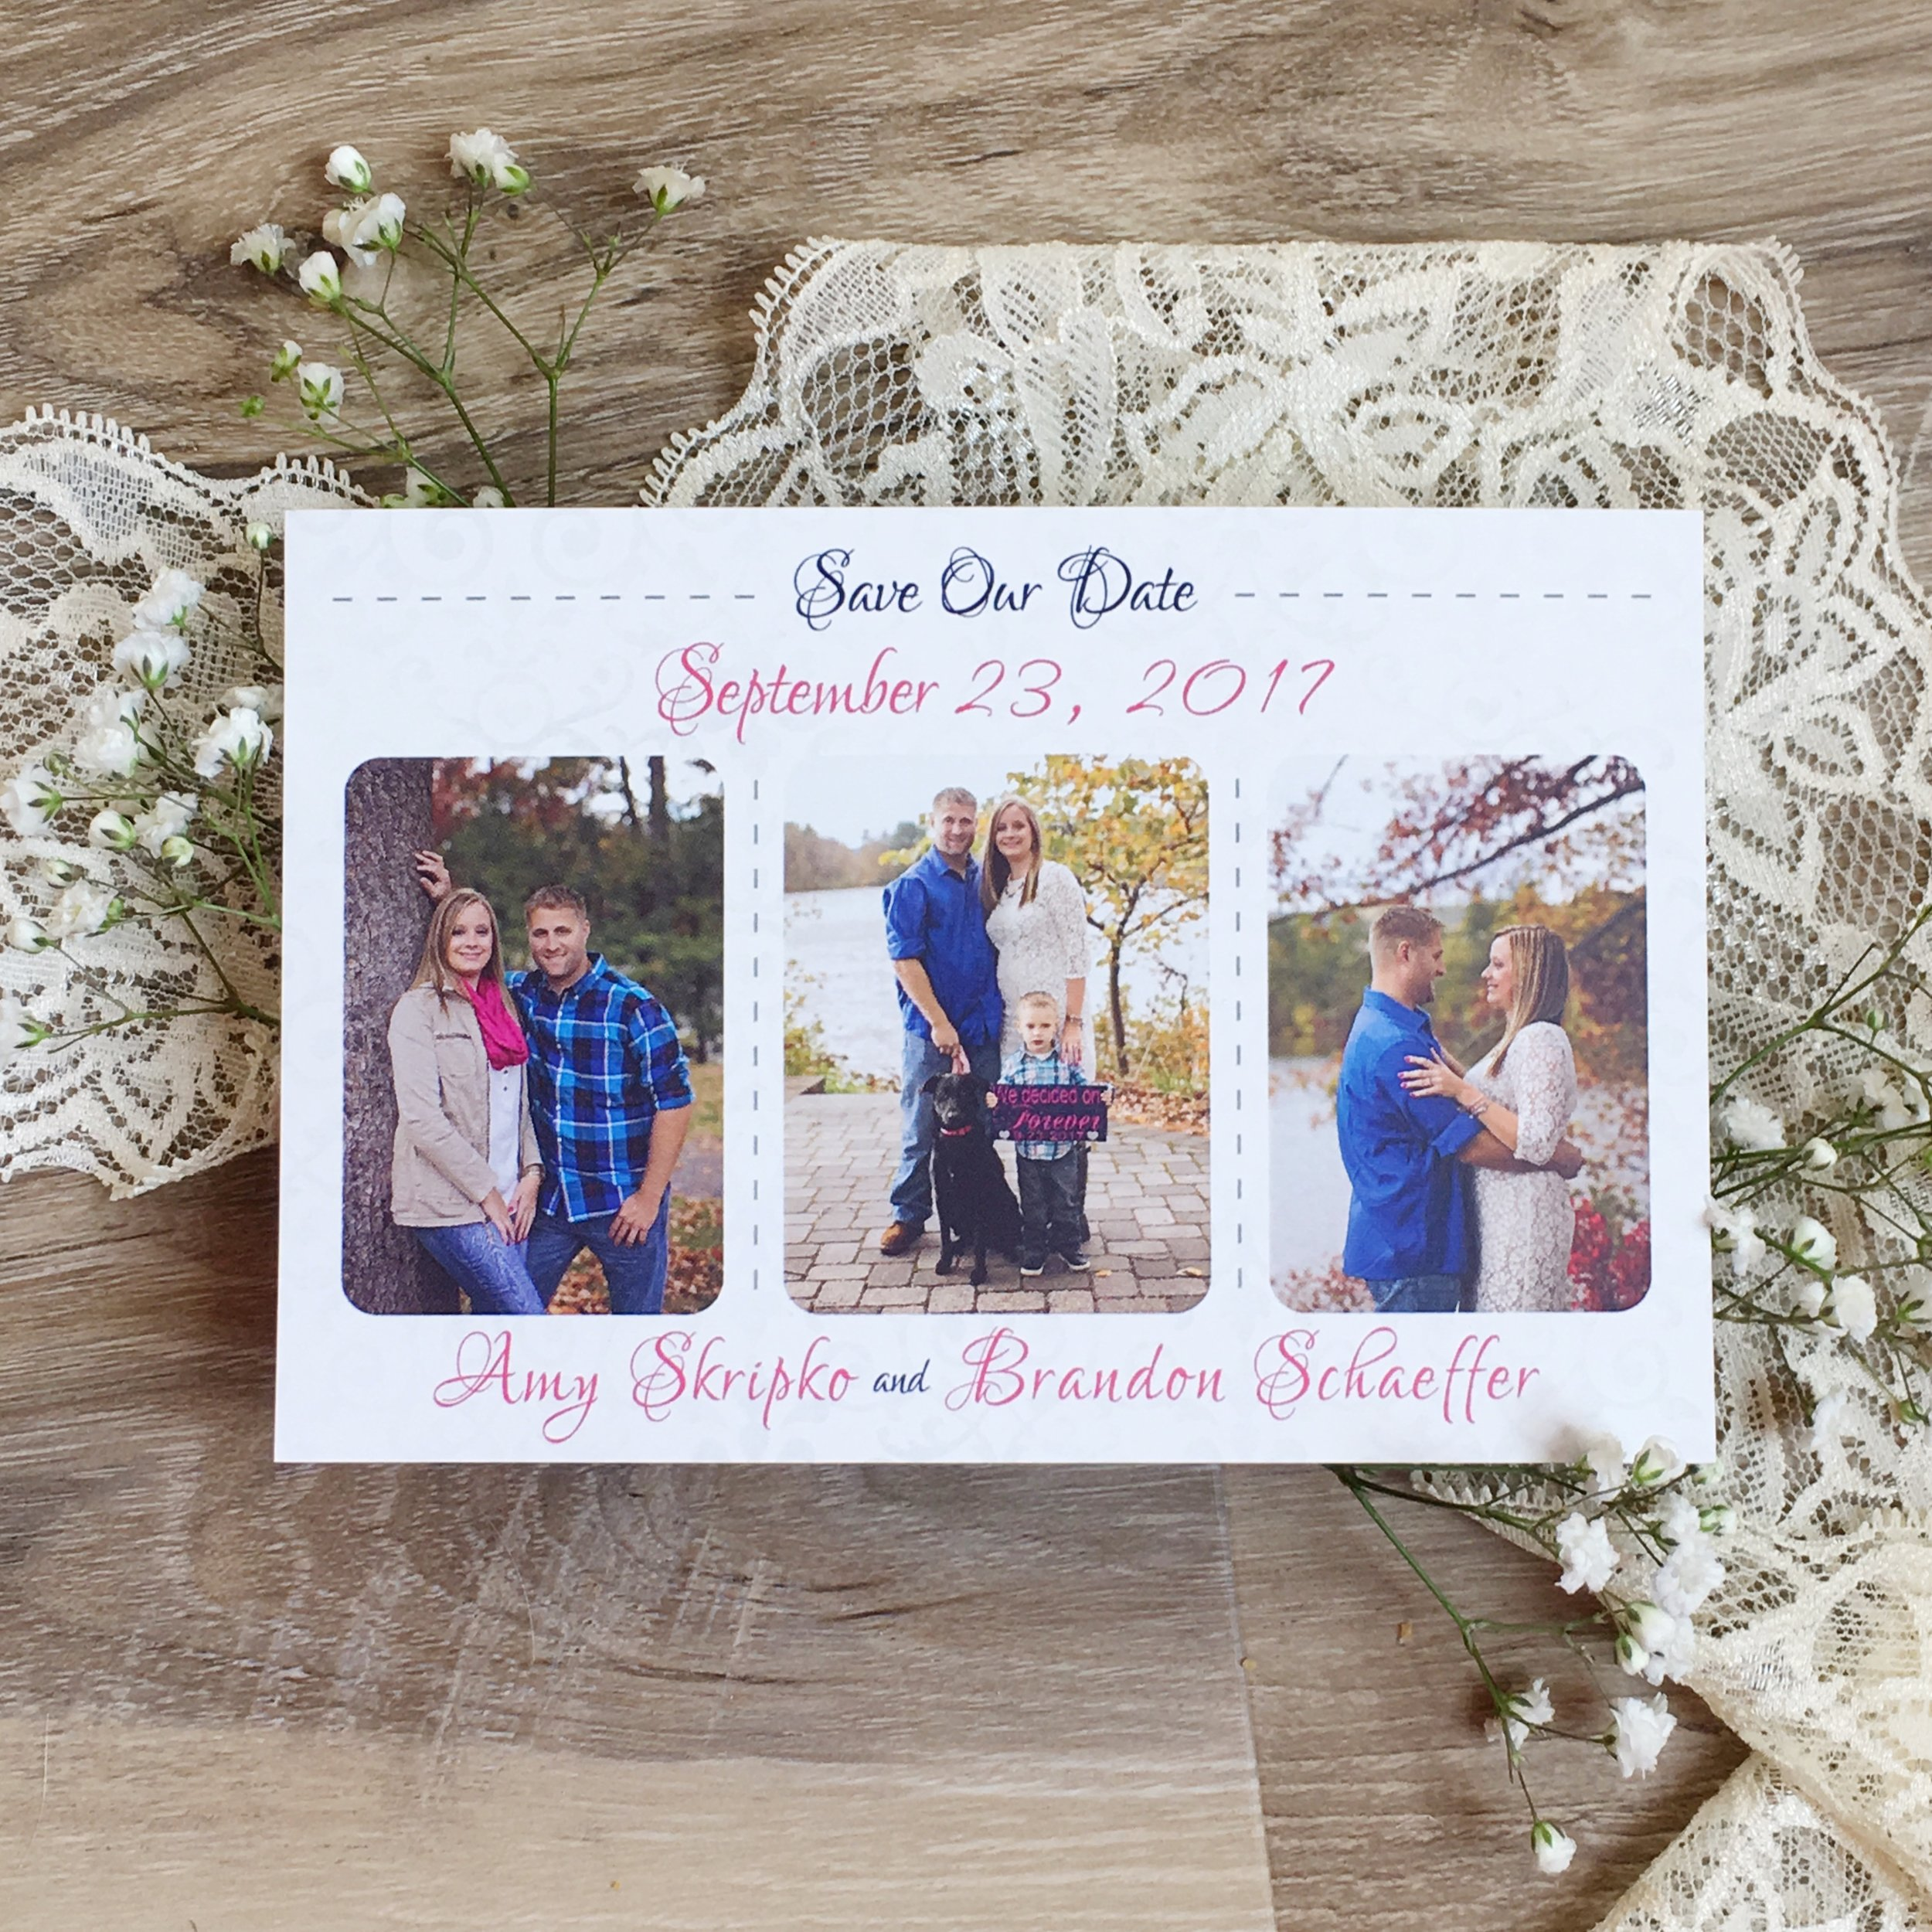 Central PA, York PA, JesSmith Designs, custom, wedding, invitations, bridal, announcements, save the date-02-02 20.23.04.jpg